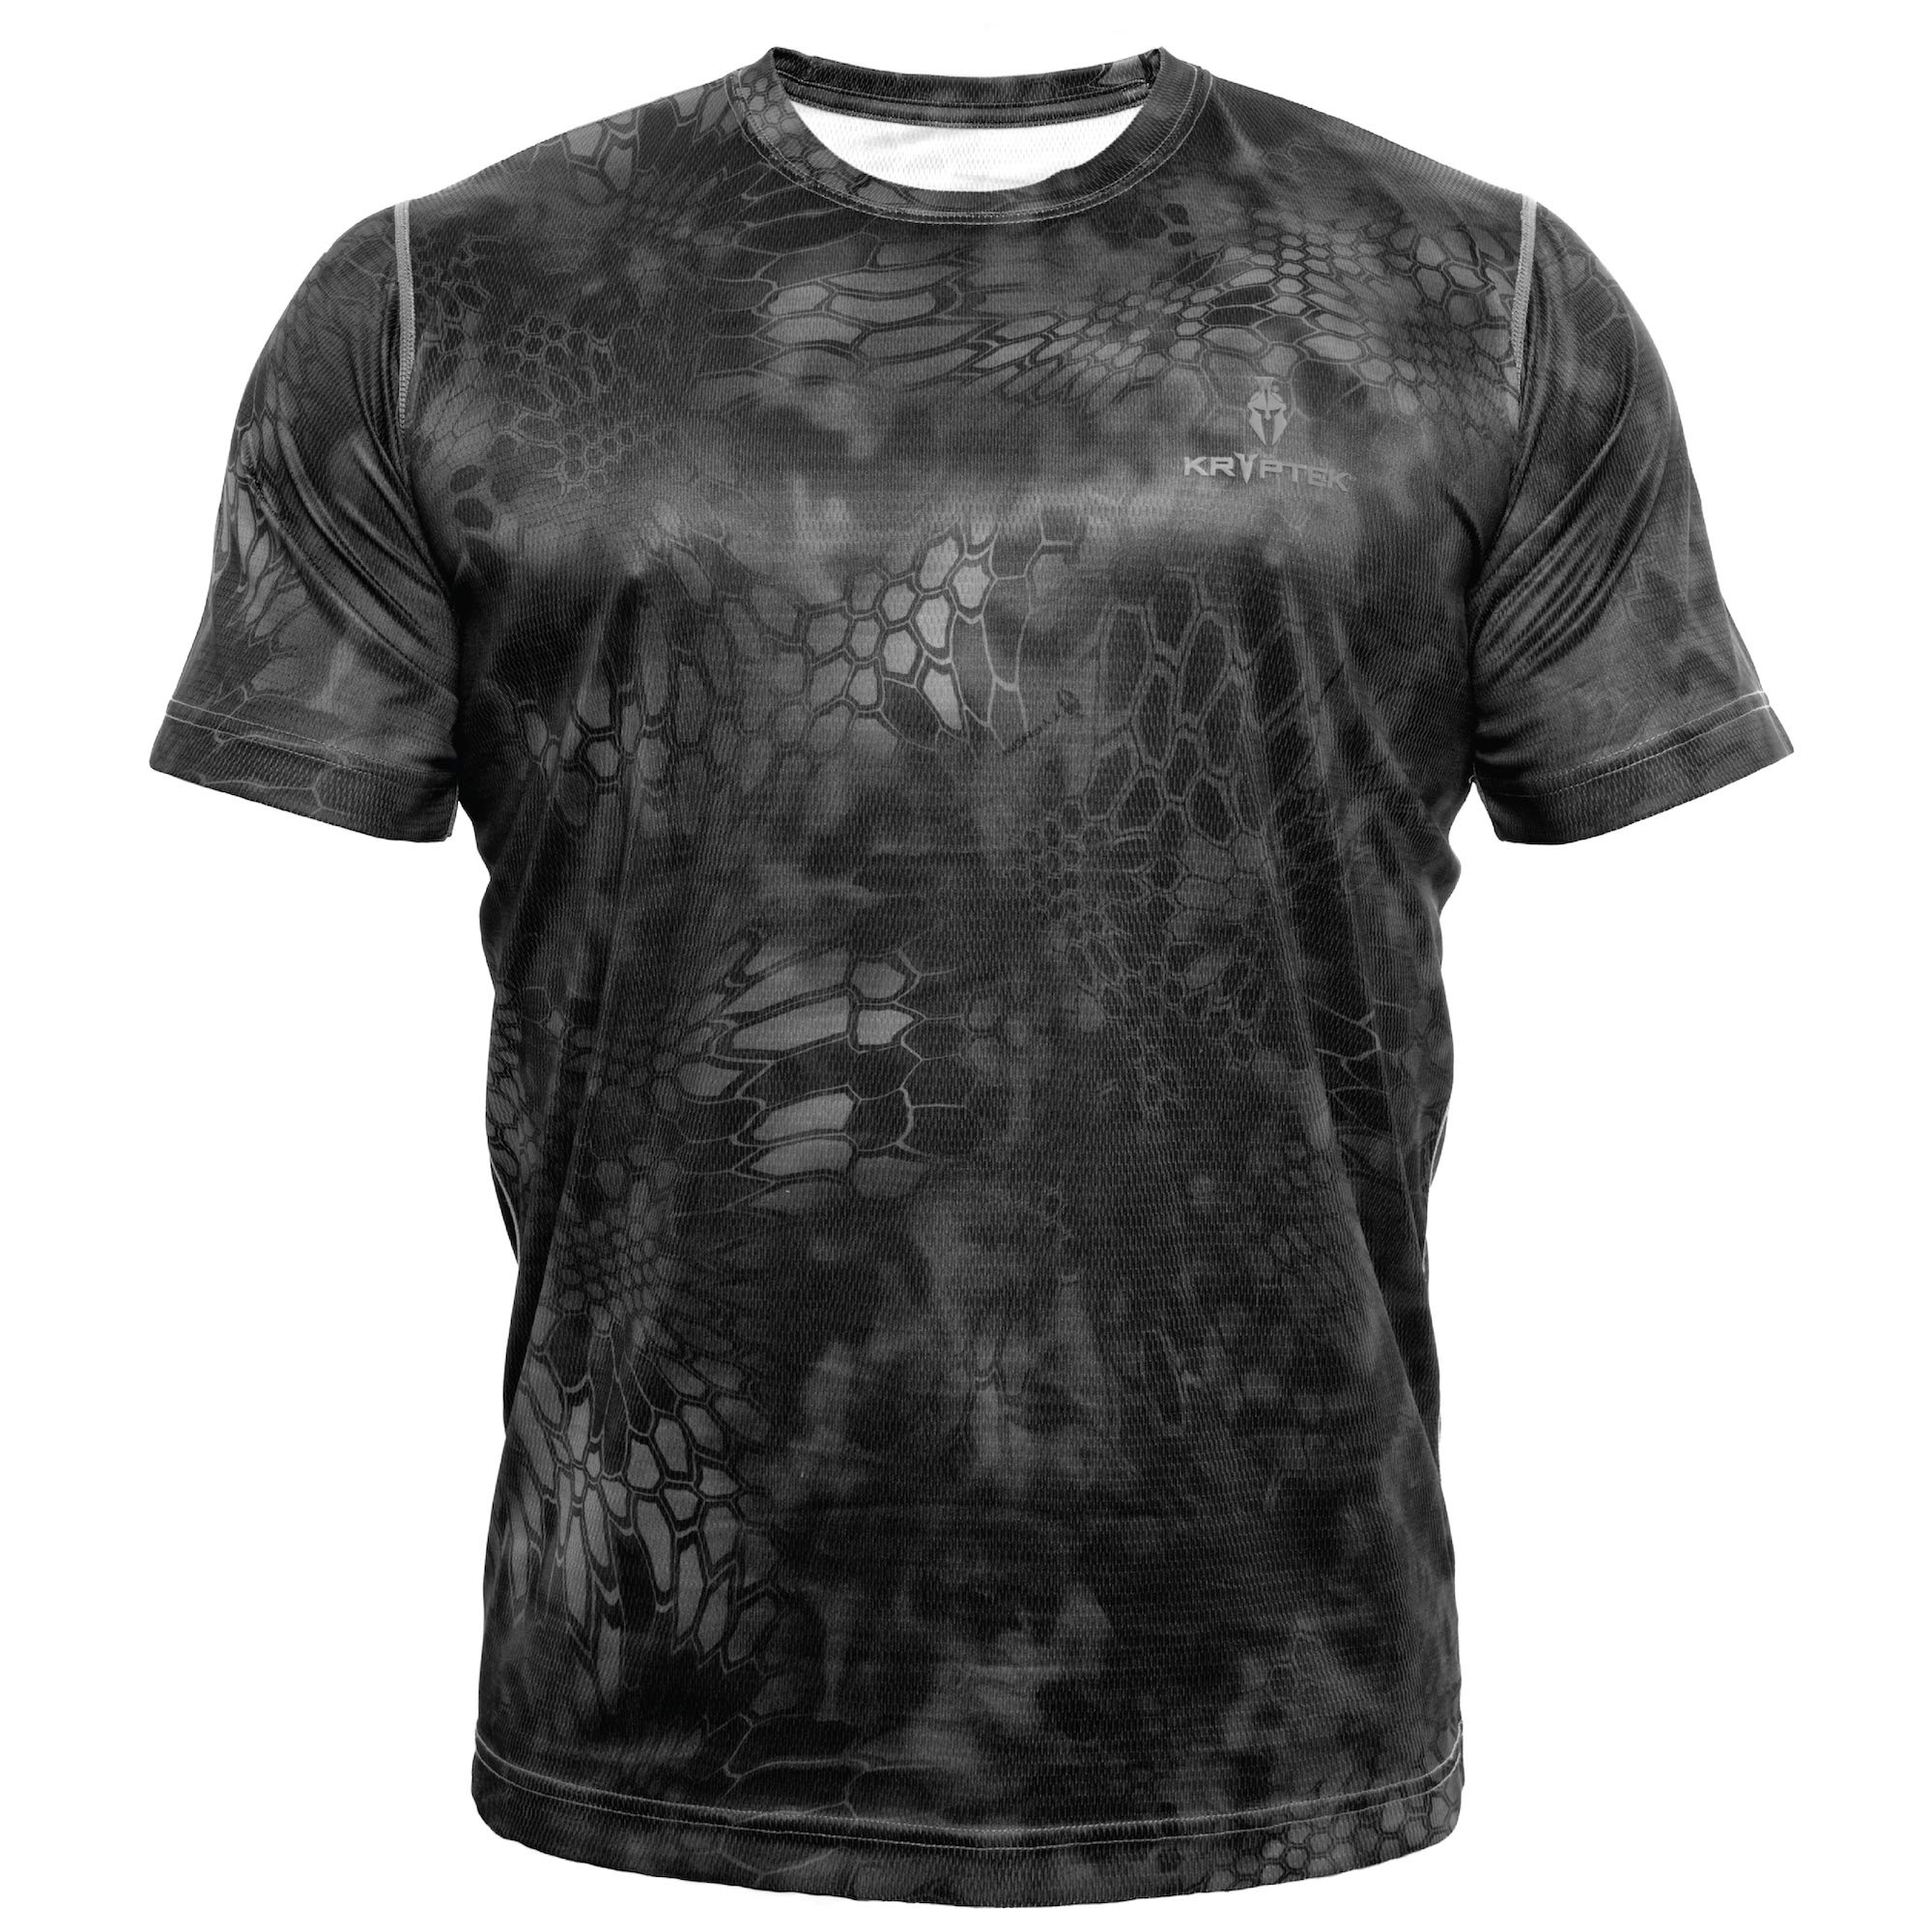 Kryptek Hyperion SS Crew - Short Sleeve Camo Hunting & Fishing Shirt (K-Ore Collection), Typhon, XL by Kryptek